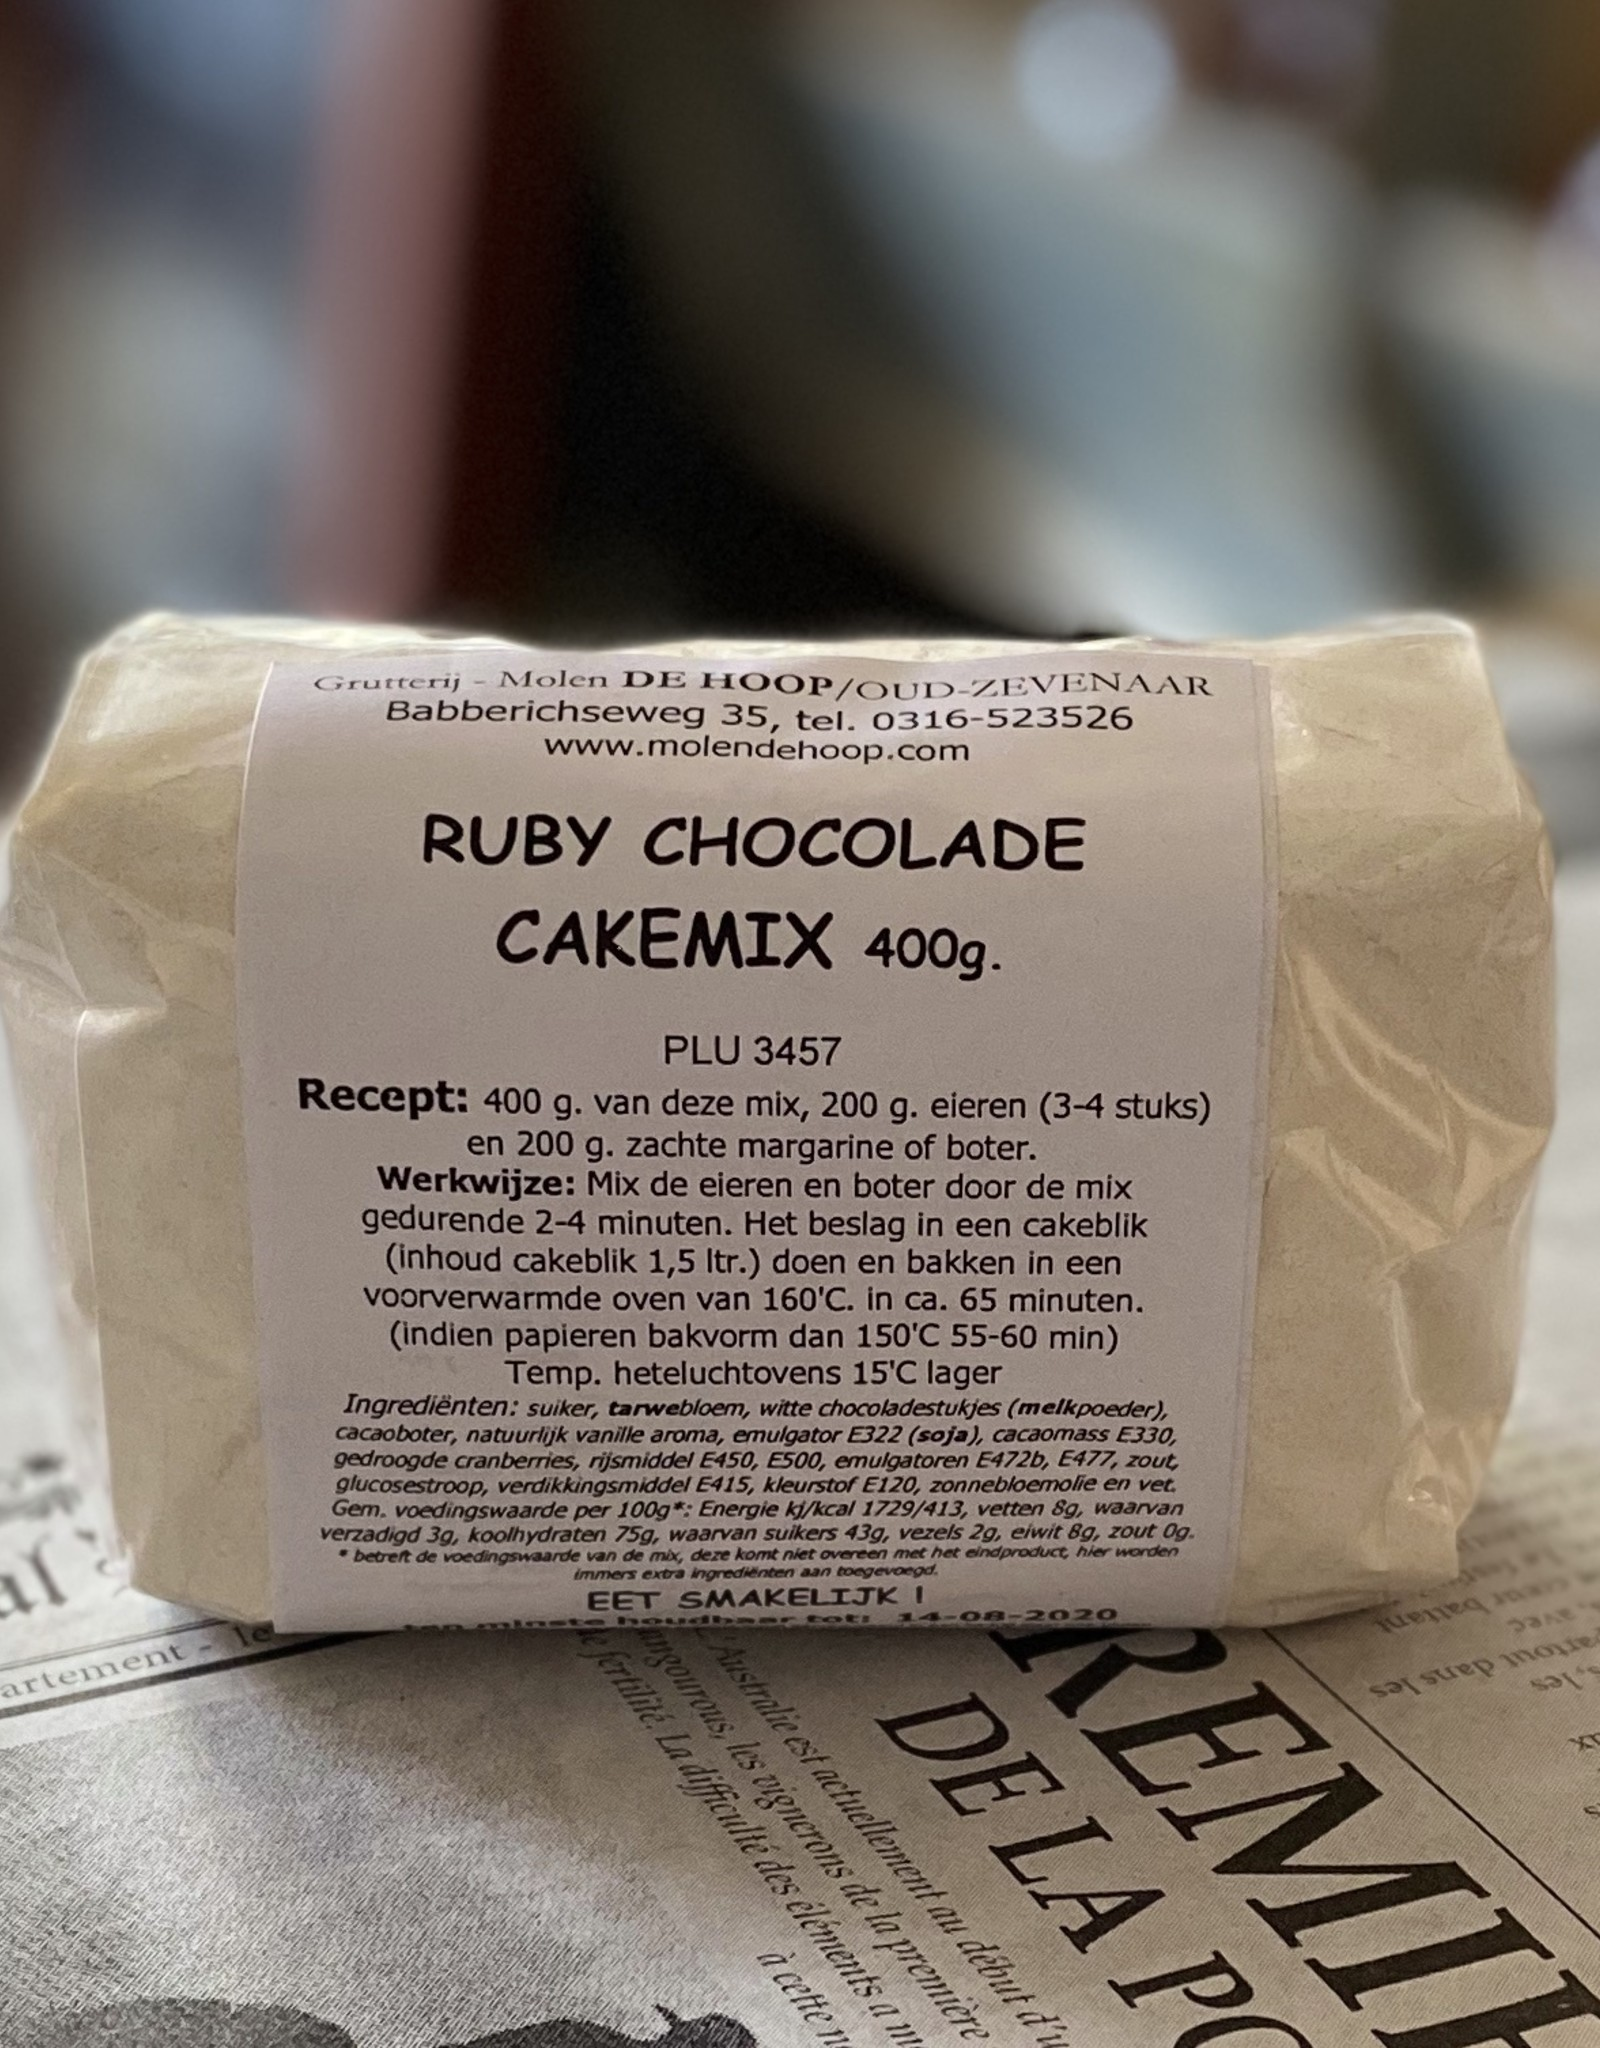 Ruby Chocolate Cakemix